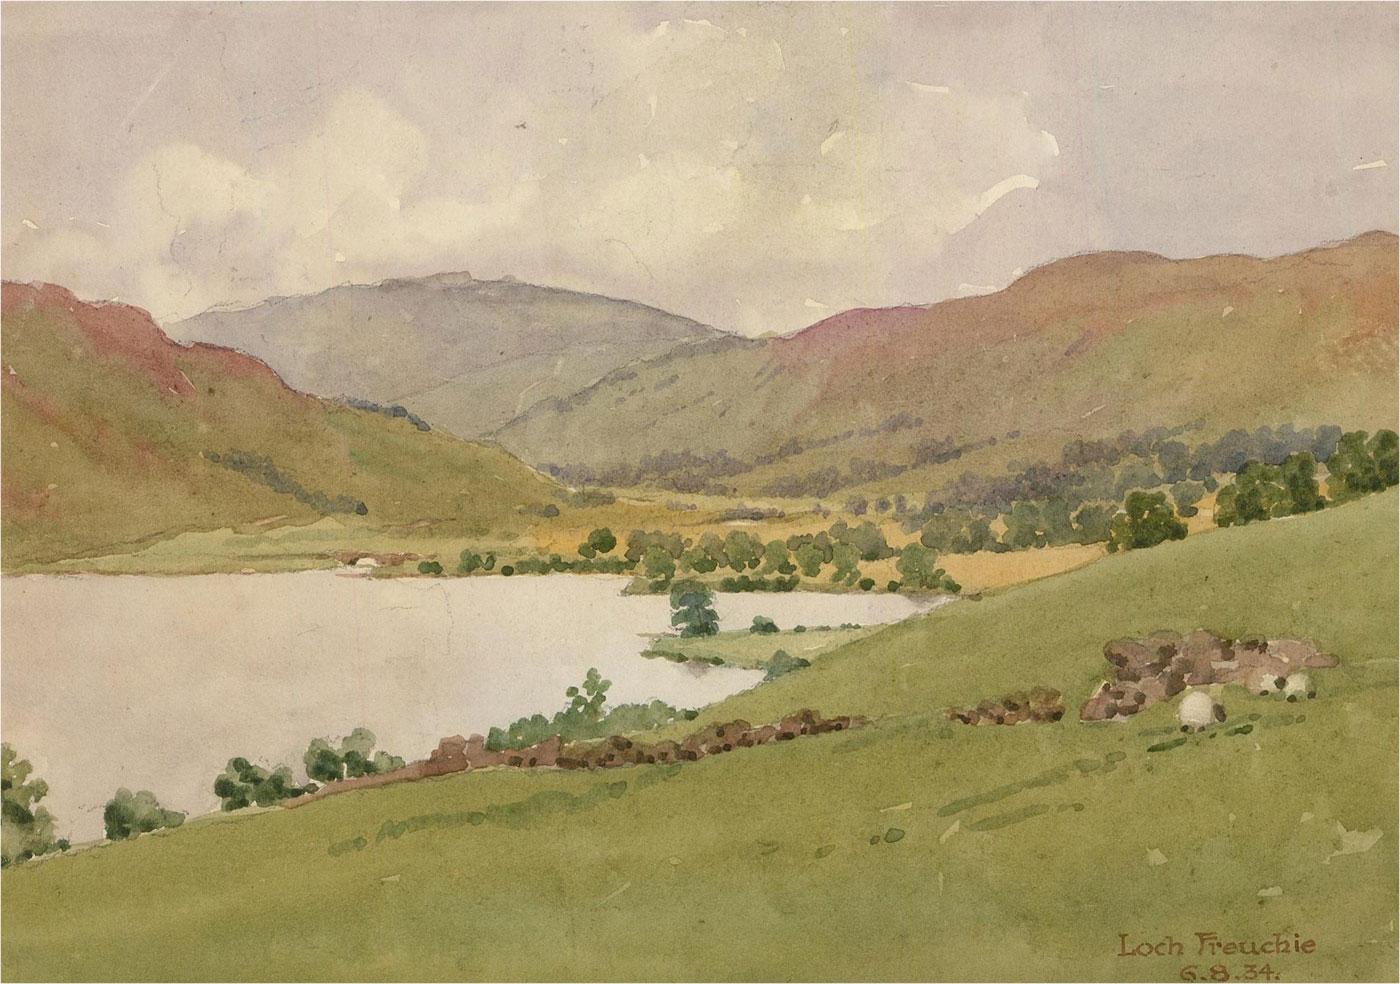 Raymond Turner Barker (1872-1945) - 1934 Watercolour, Loch Freuchie